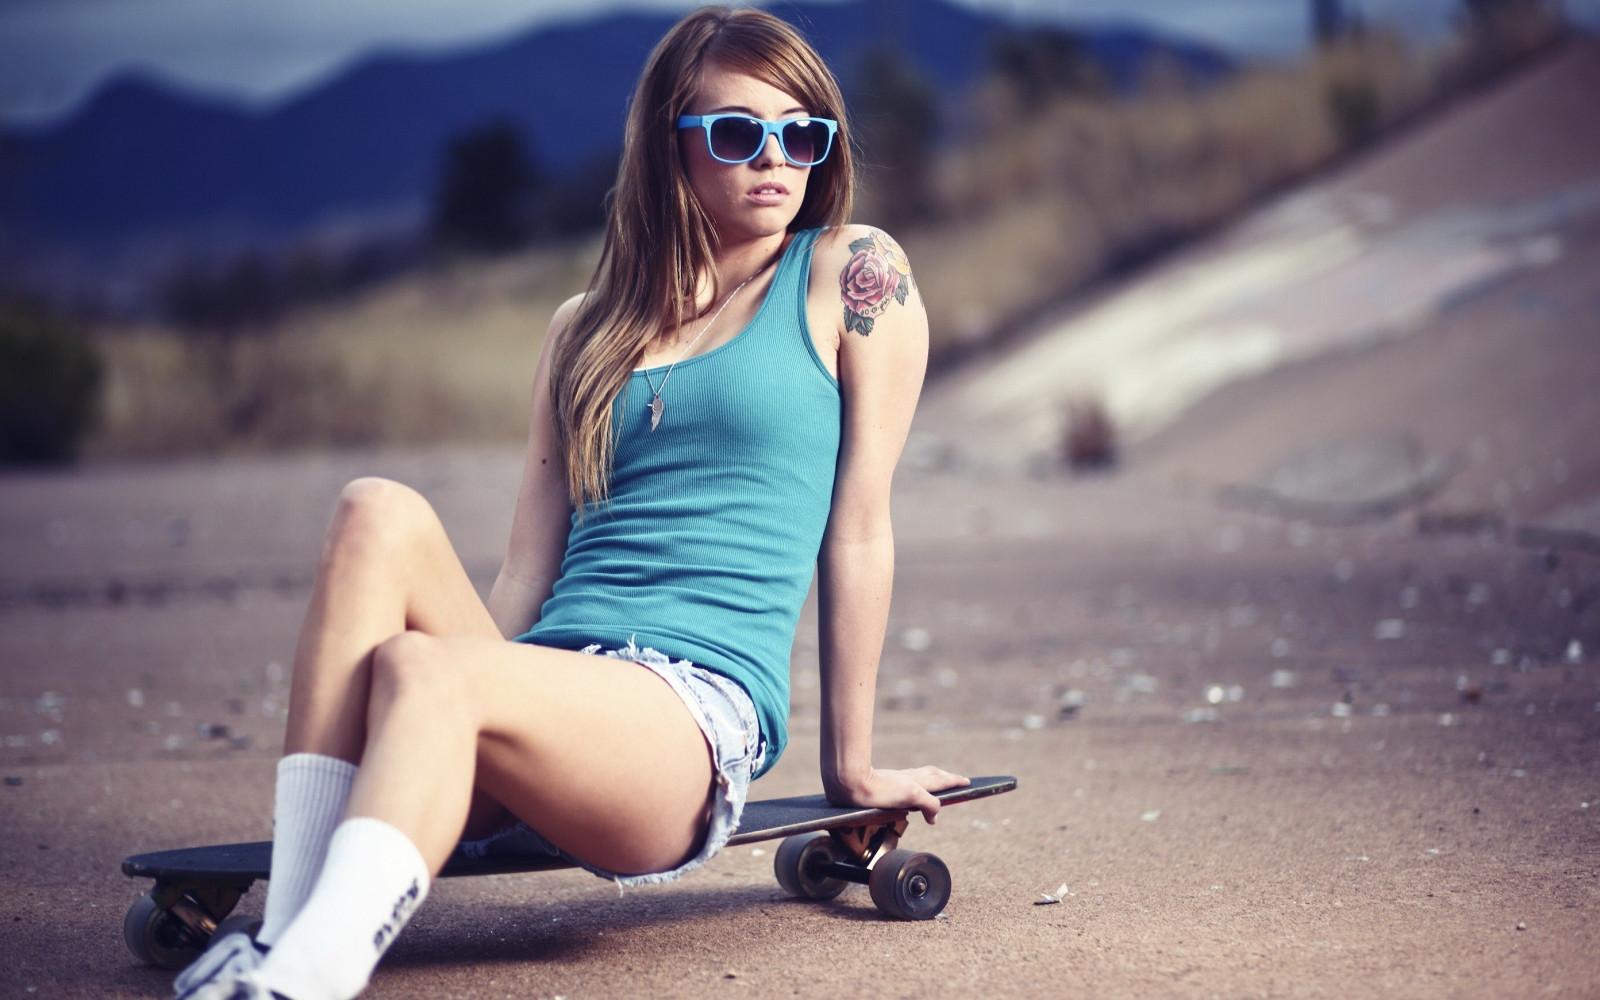 Скейтборд с девушками фото